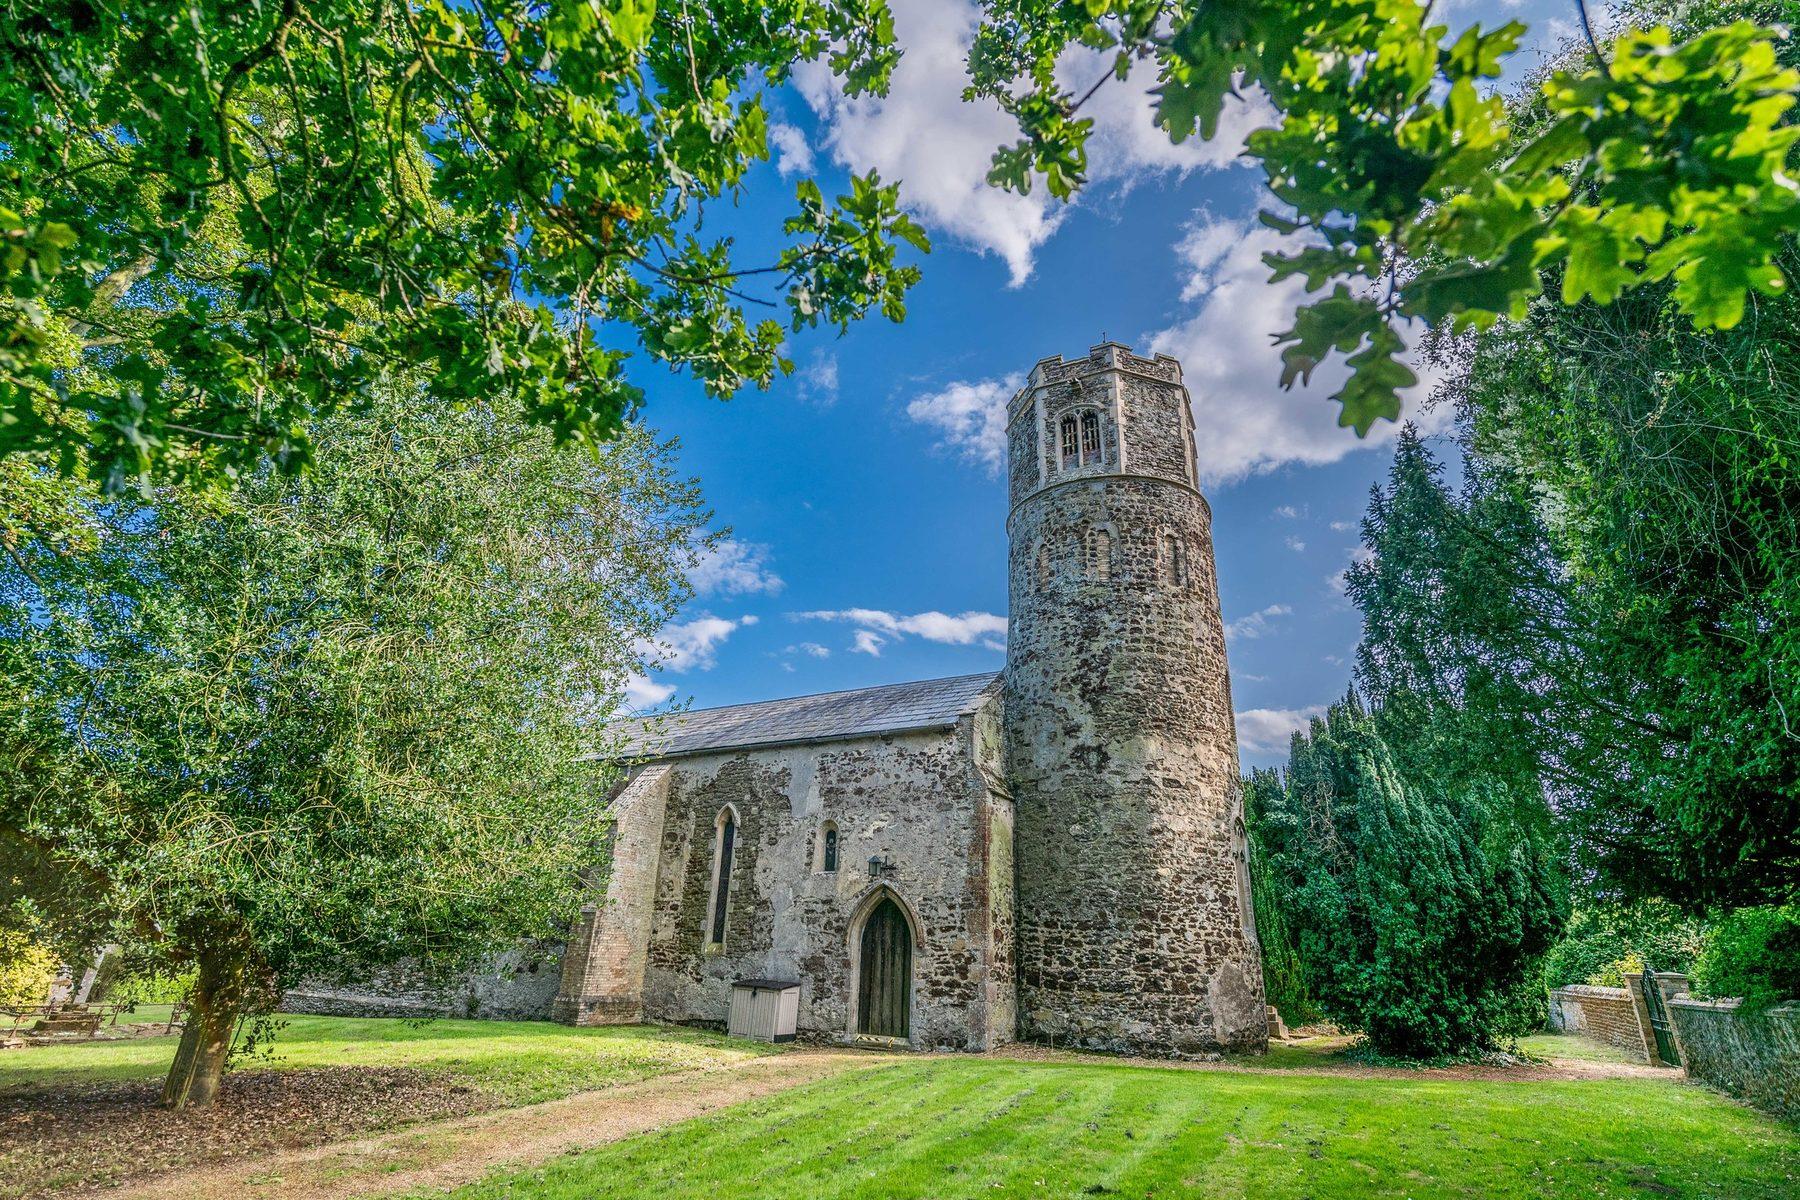 002 Bexwell Church 2018